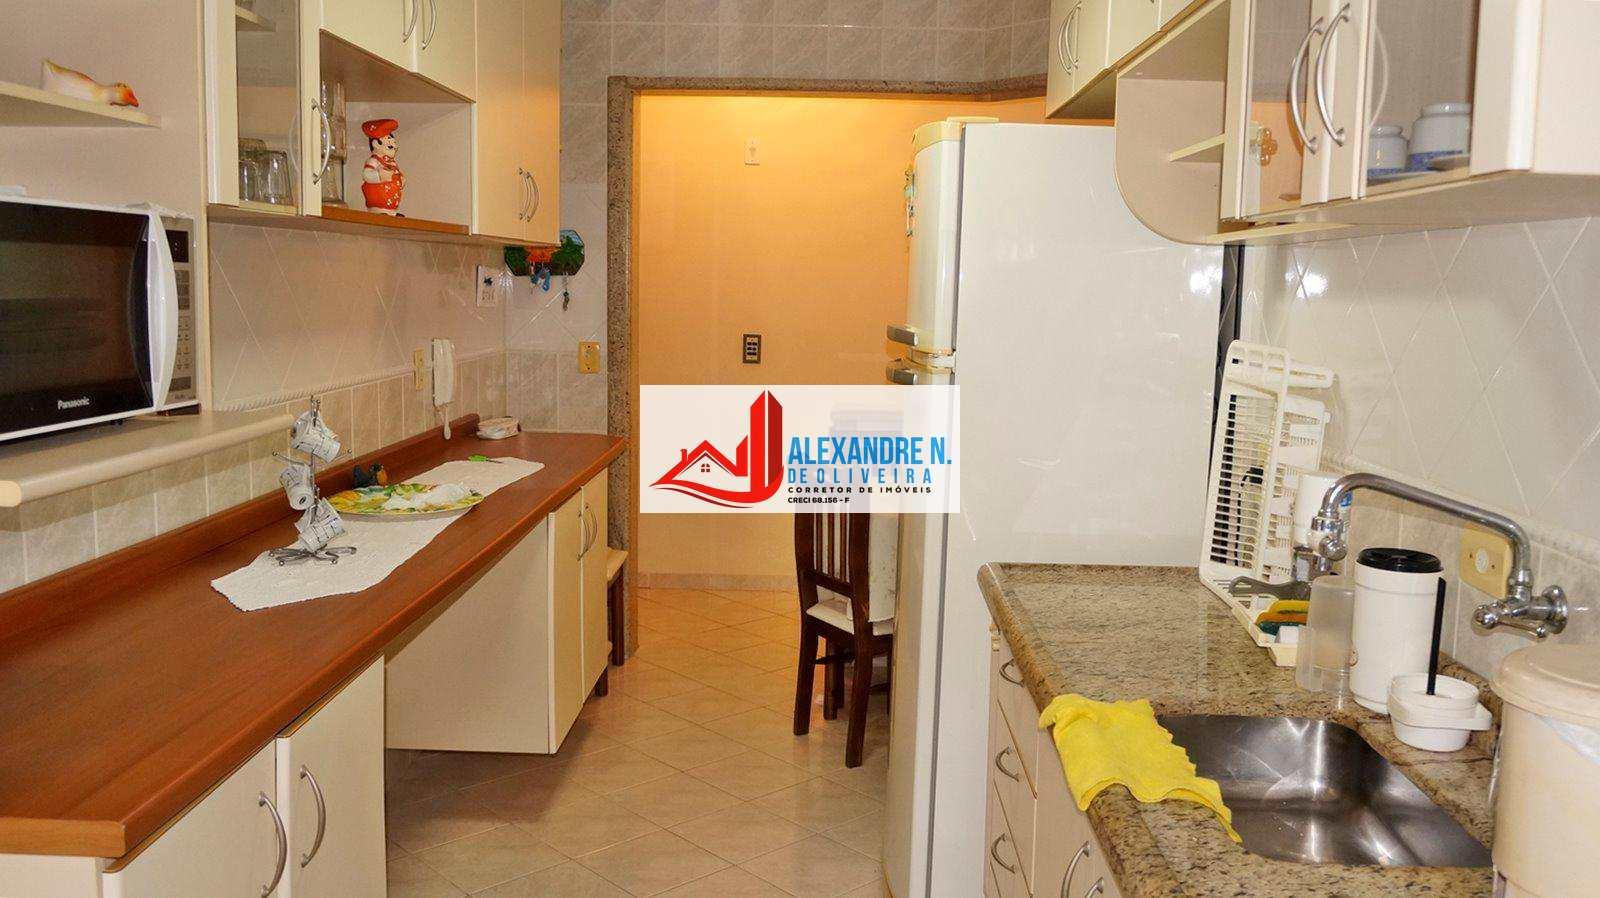 Vista-mar, 2 dorms, Ocian, Praia Grande, RS 250 mil, AP00459